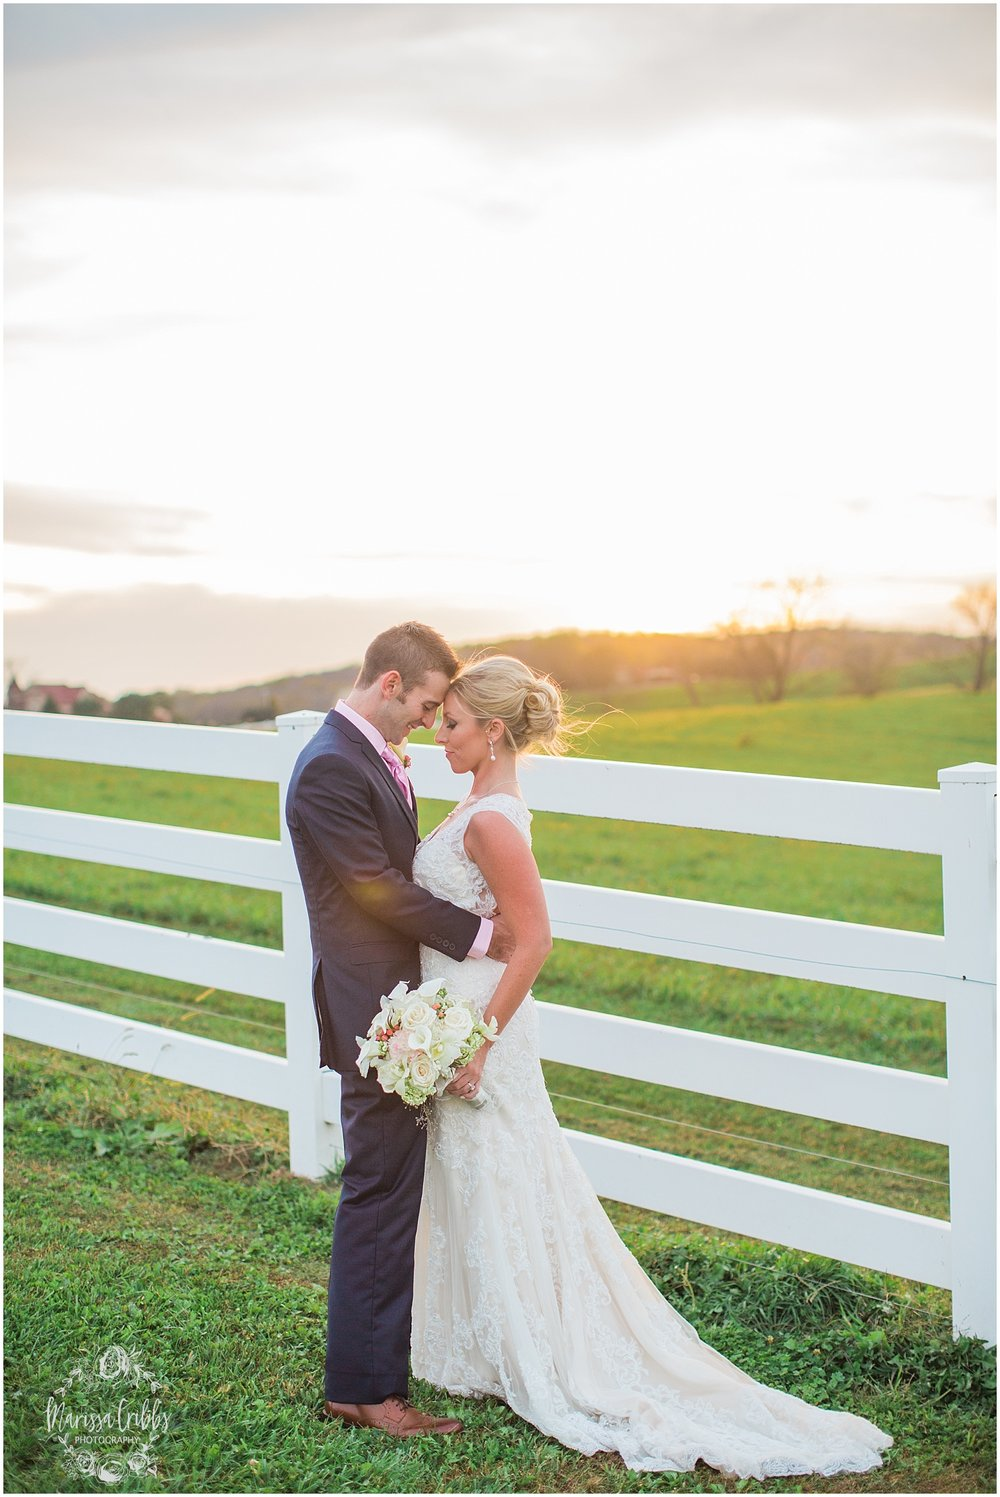 Alex & Amie | Eighteen Ninety Event Space | Marissa Cribbs Photography | Kansas City Perfect Wedding Guide_1359.jpg